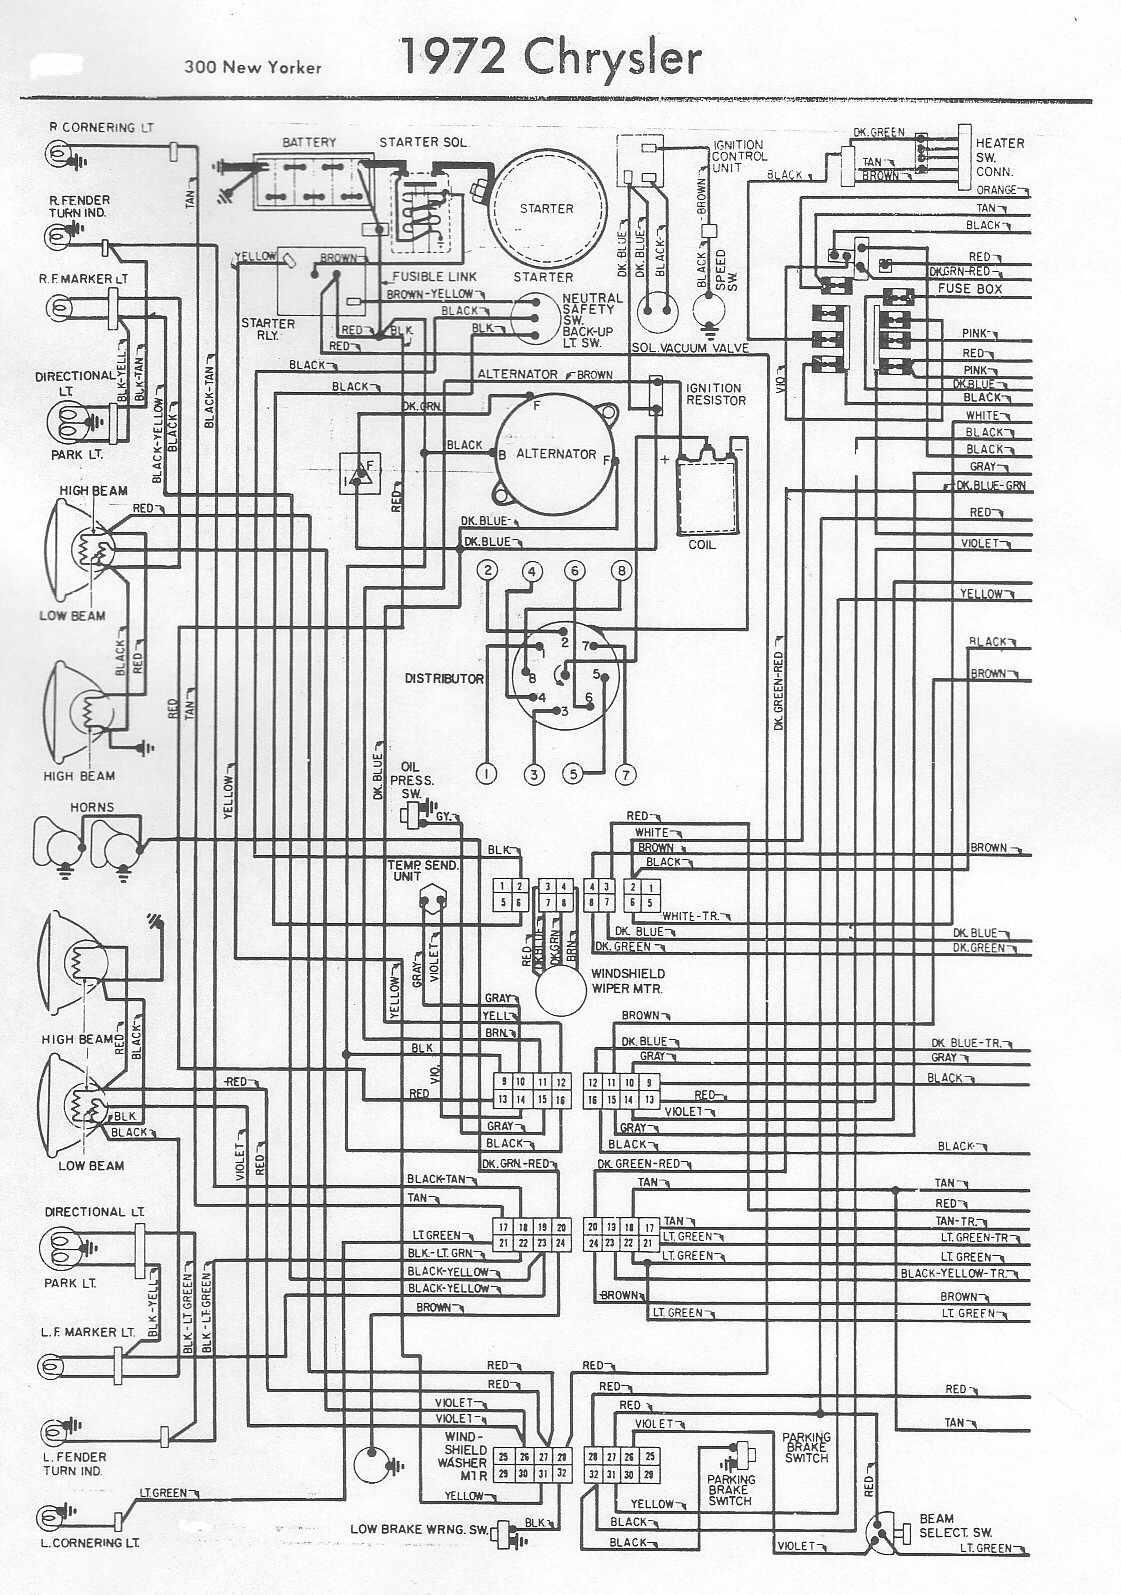 medium resolution of 2002 cadillac deville wiring harness wiring library2000 cadillac eldorado electrical diagrams schematics wiring 2002 cadillac eldorado